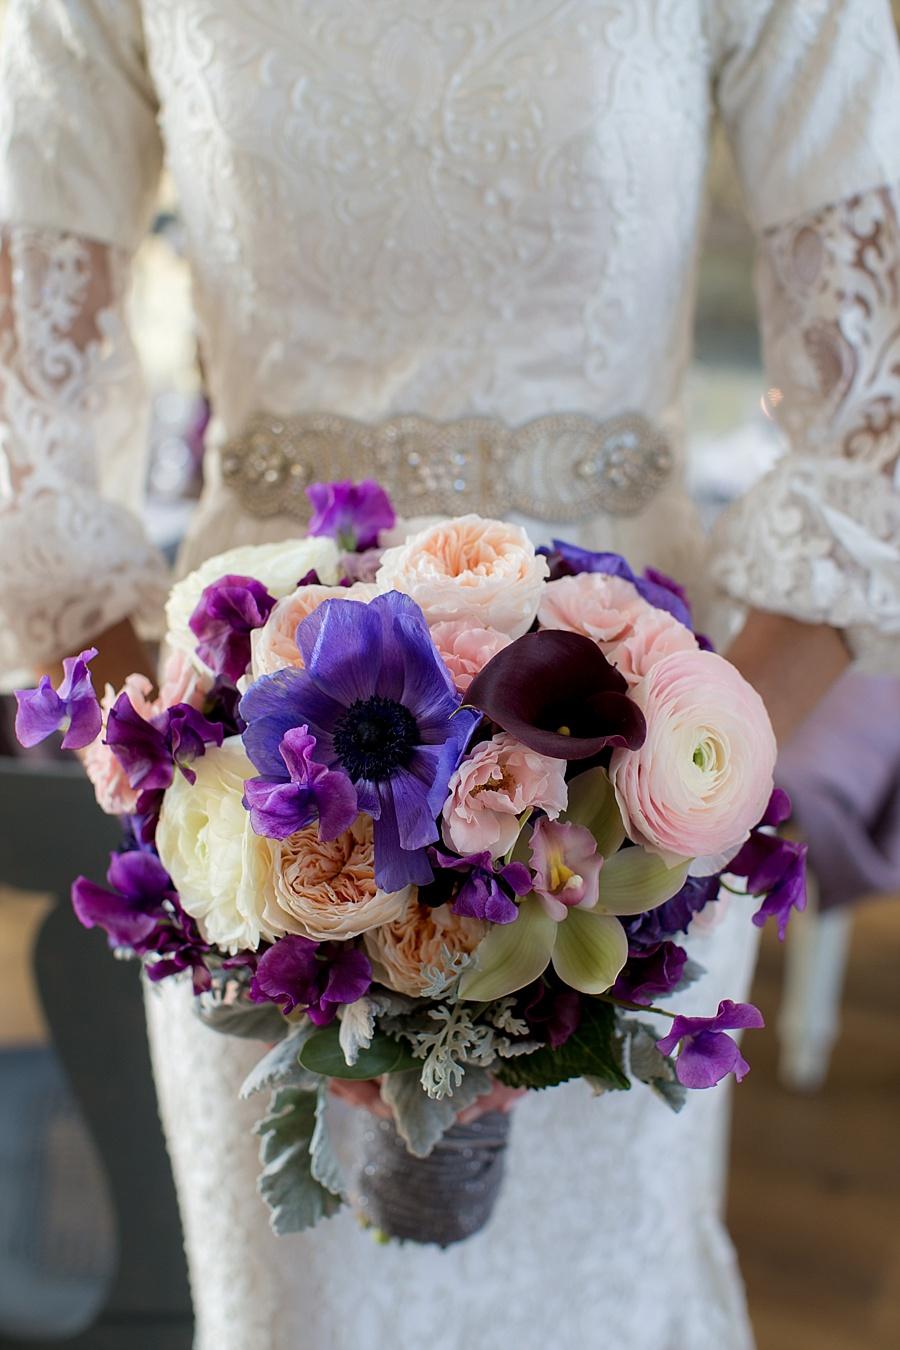 Vanessa_Joy_Photography_Details_of_I_do_Jean_Ralph_Thurin_Wedding_Gowns_April_Lynn_Designs_Wedding_Stationery11